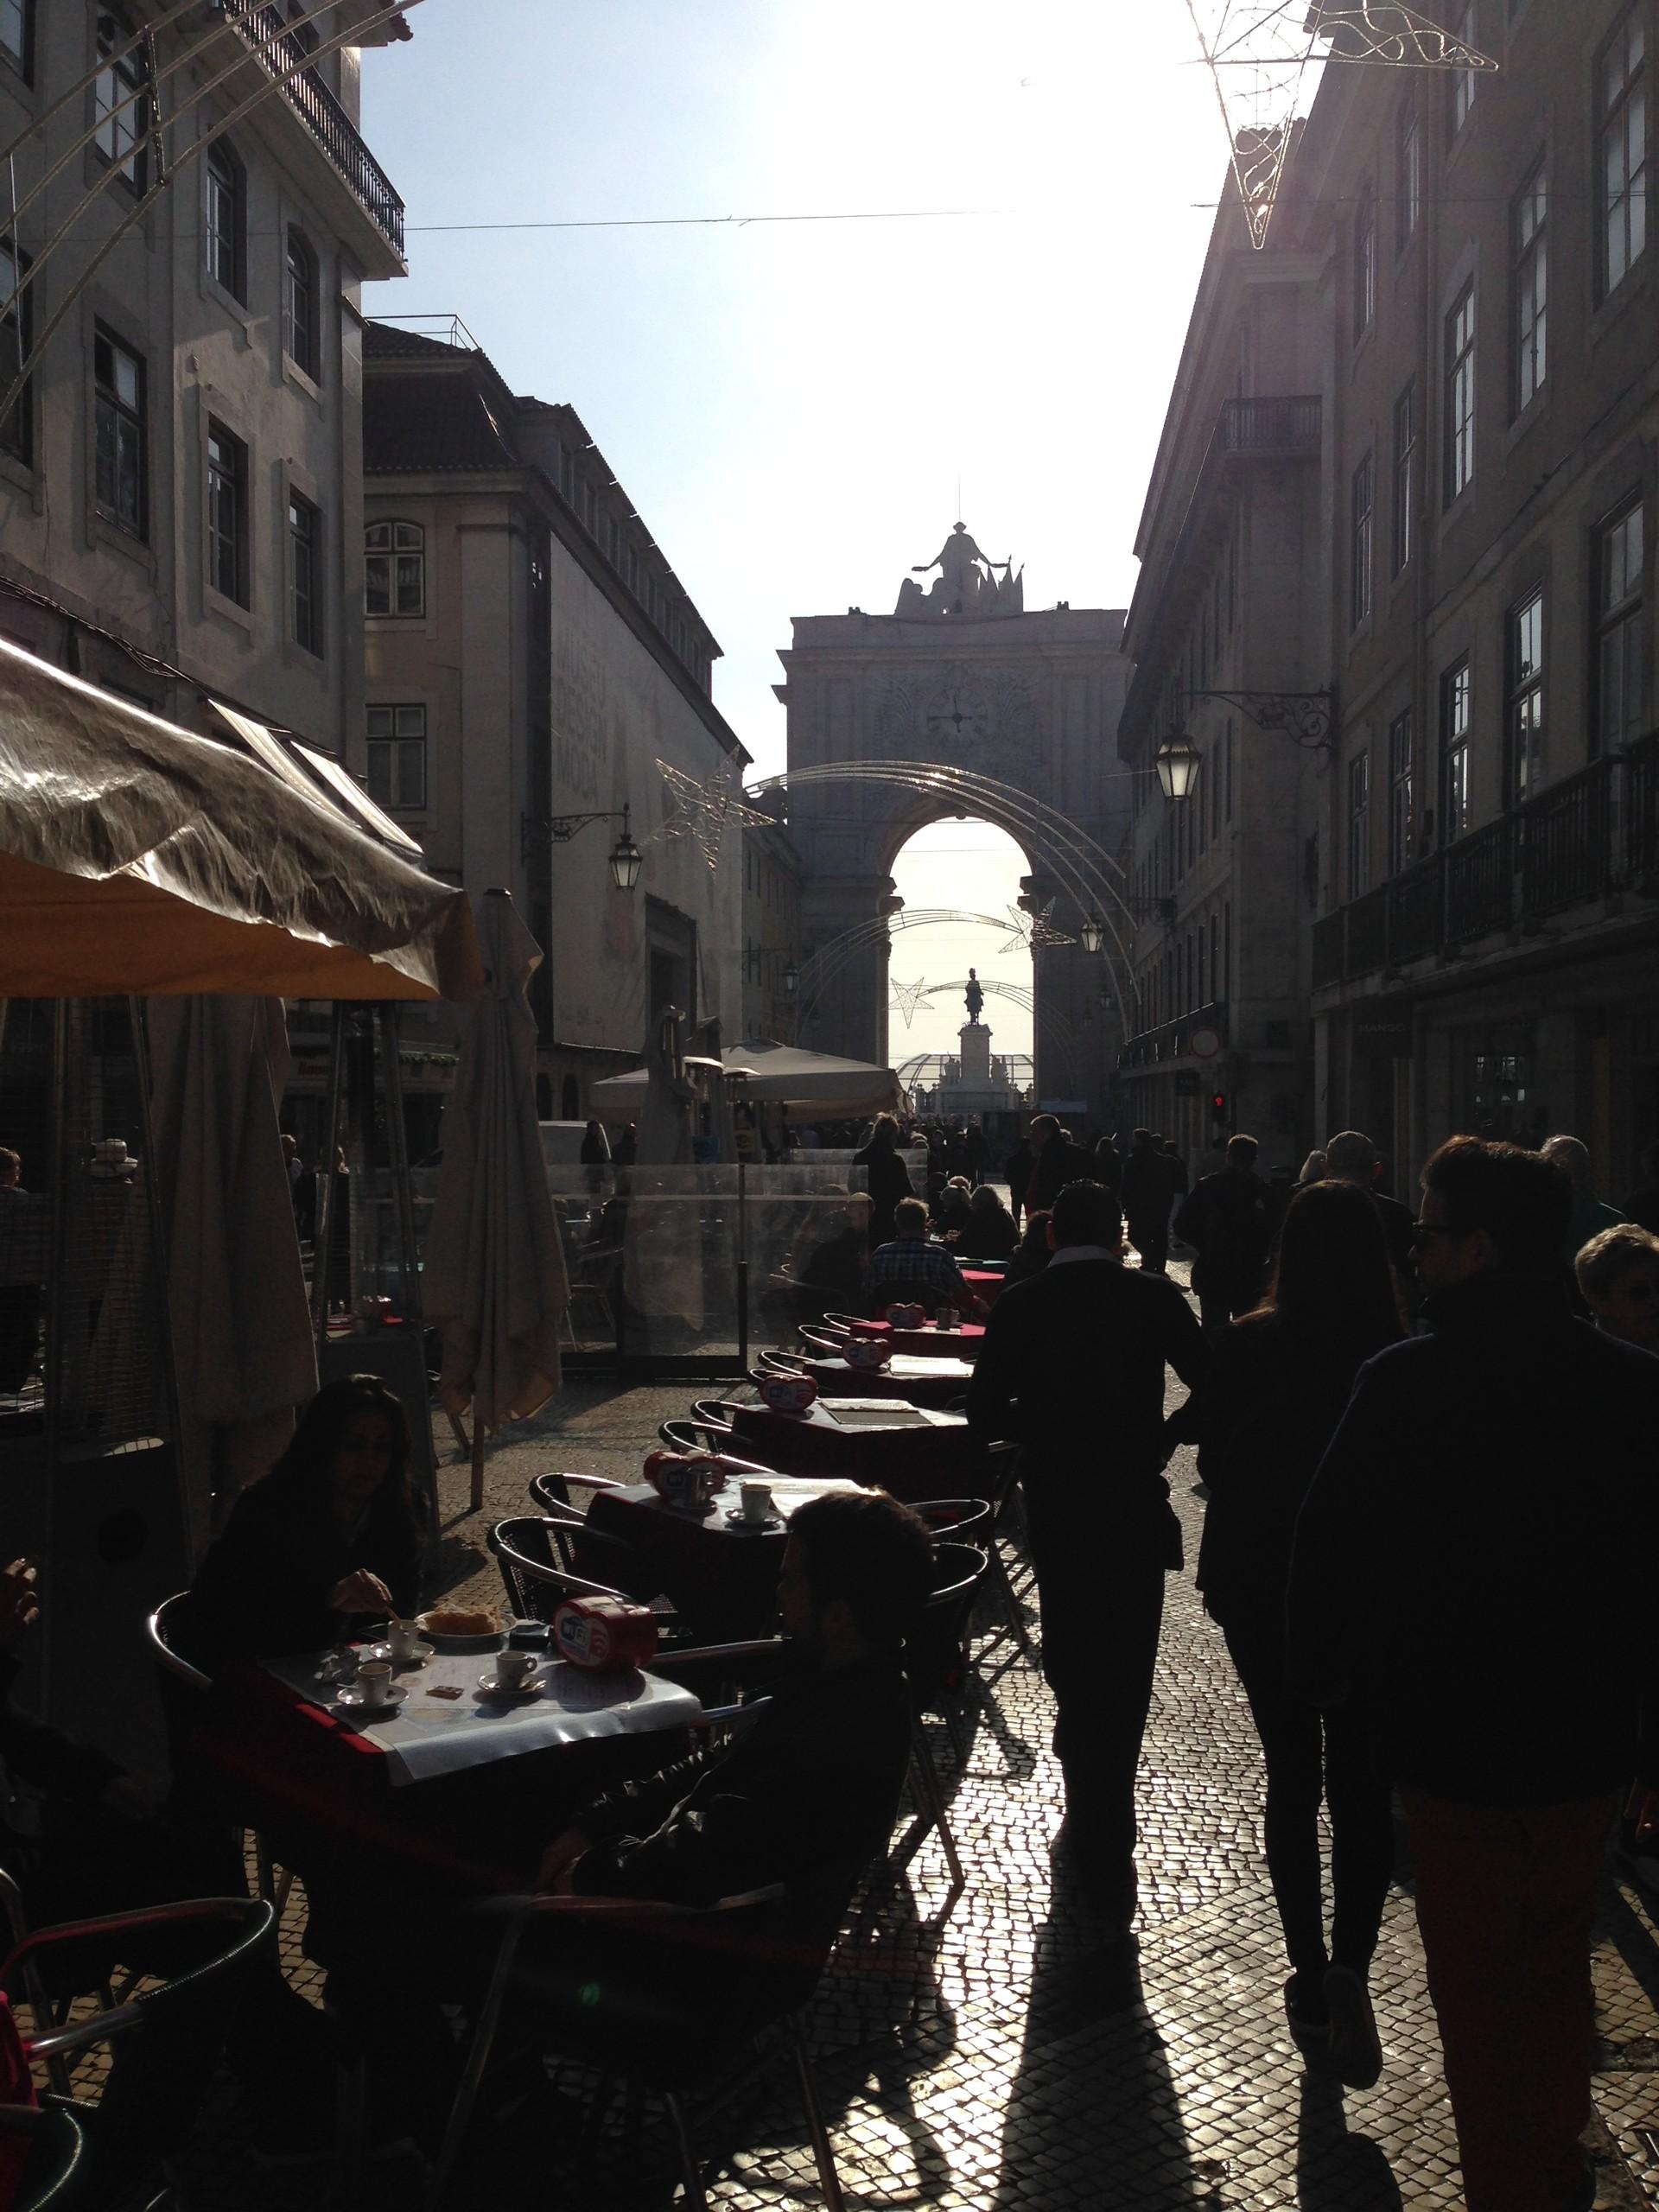 lisbonz-dintorni-piazza-commercio-78ffb4